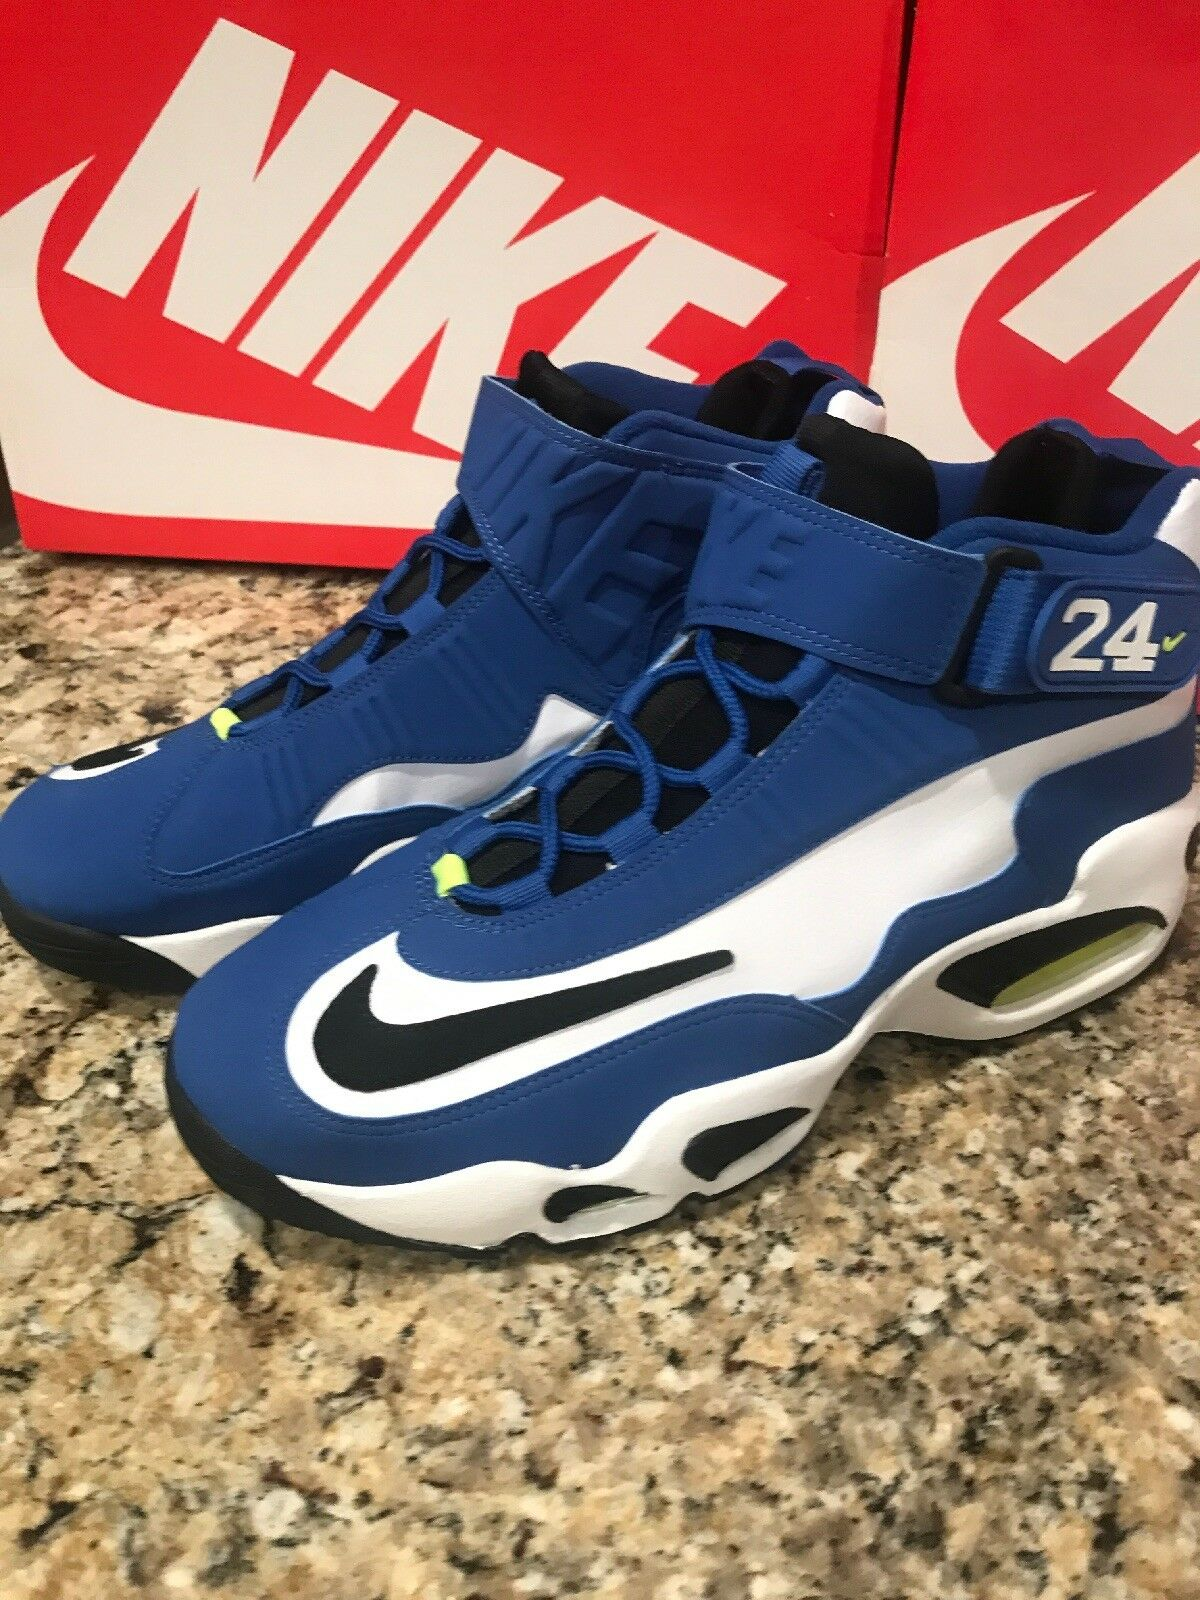 Nike Men's Air Griffey Max 1 Varsity Royal Blue 354912-400 White Volt Size 11 354912-400 Blue a0a3c1